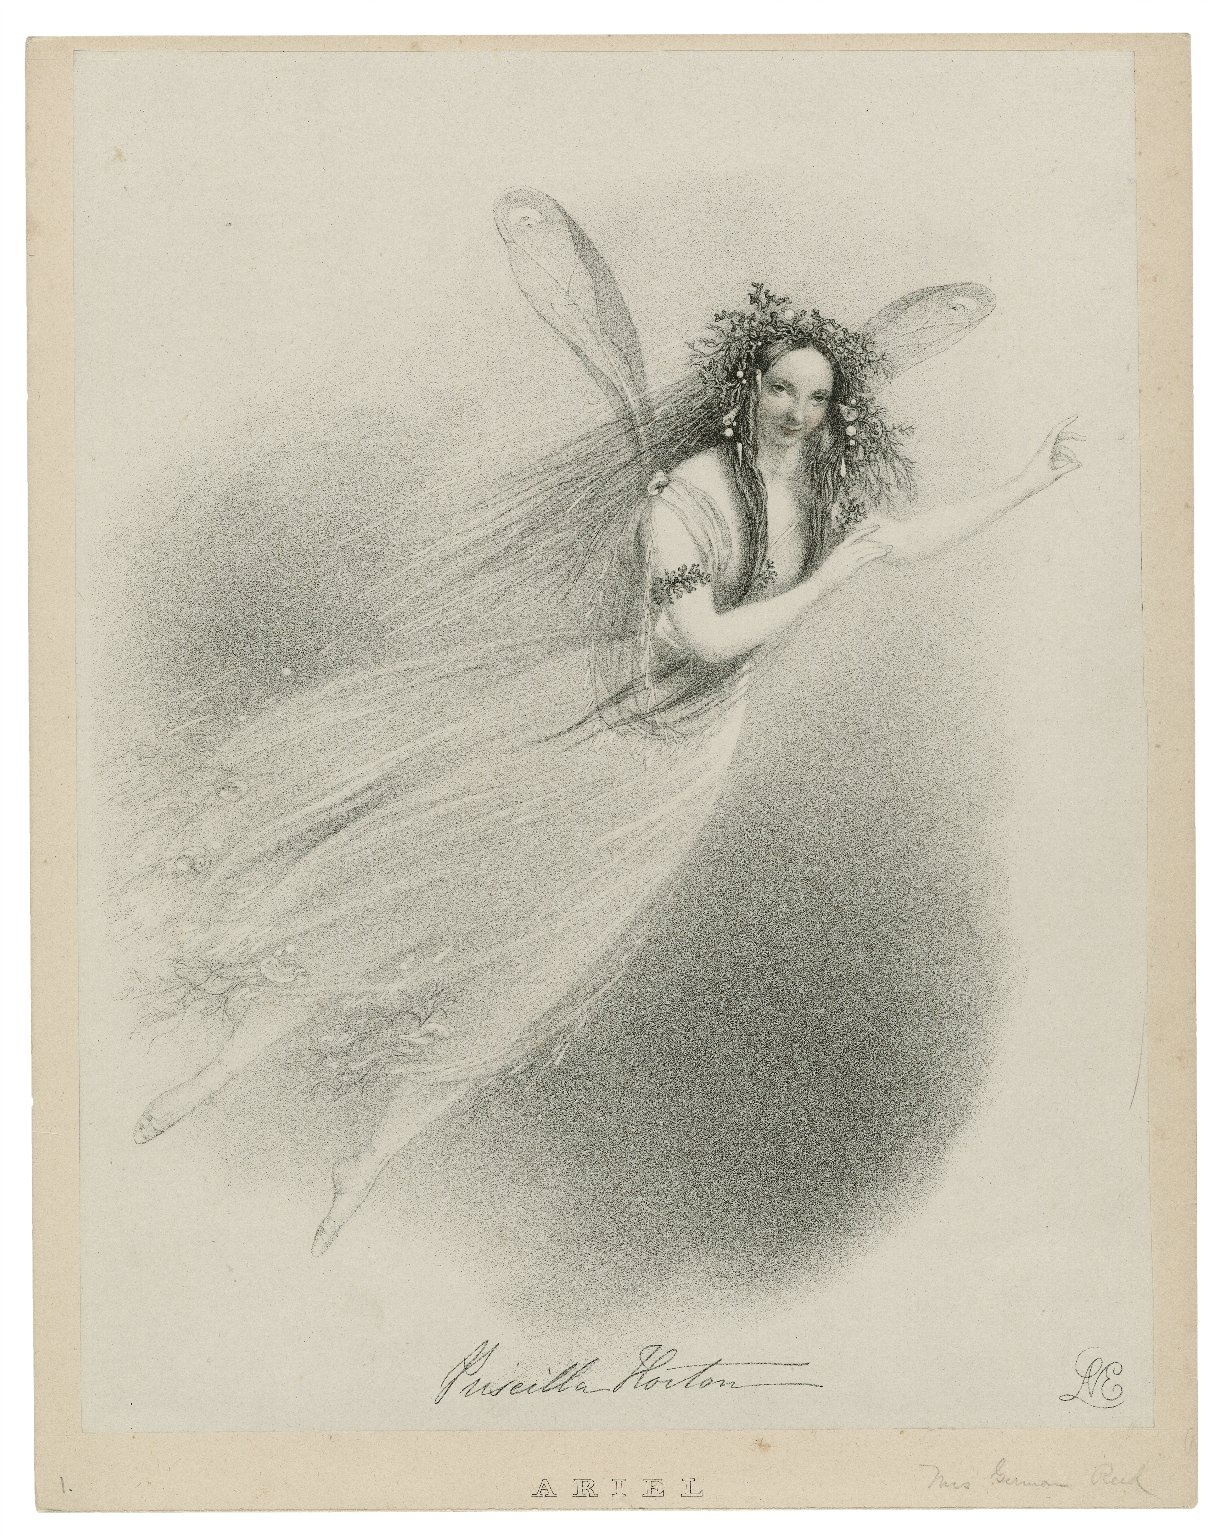 Priscilla Horton [as] Ariel [graphic] : Tempest, act 5, sc. last / Lane ; J. Graf, printer to Her Majesty.